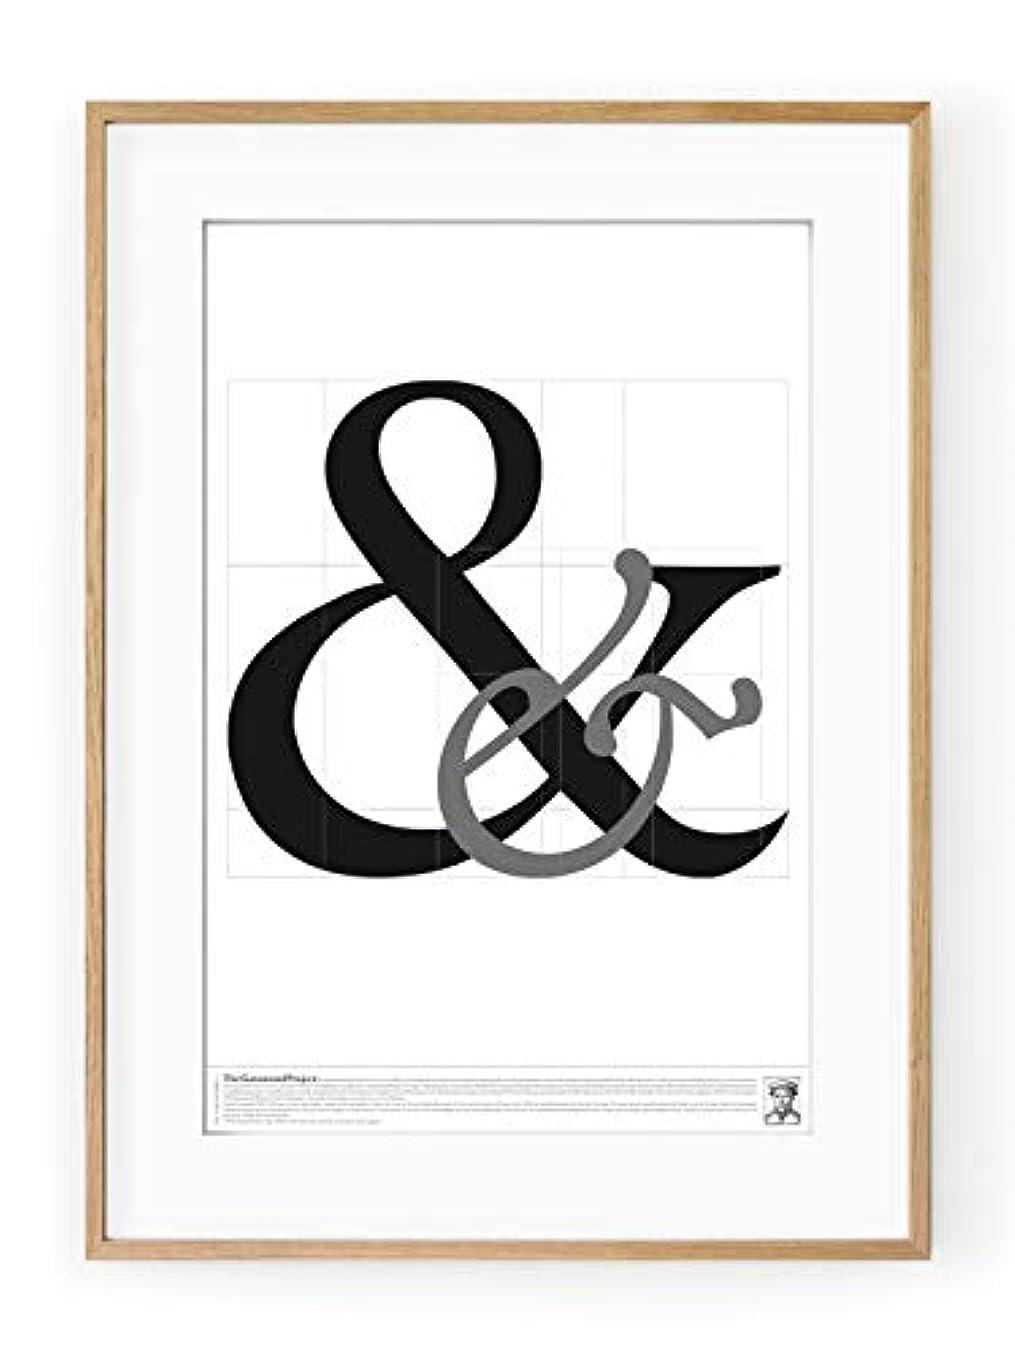 Garamond '&' Black Satin Aluminium Frame, Full Size, Multicolored, 30x40